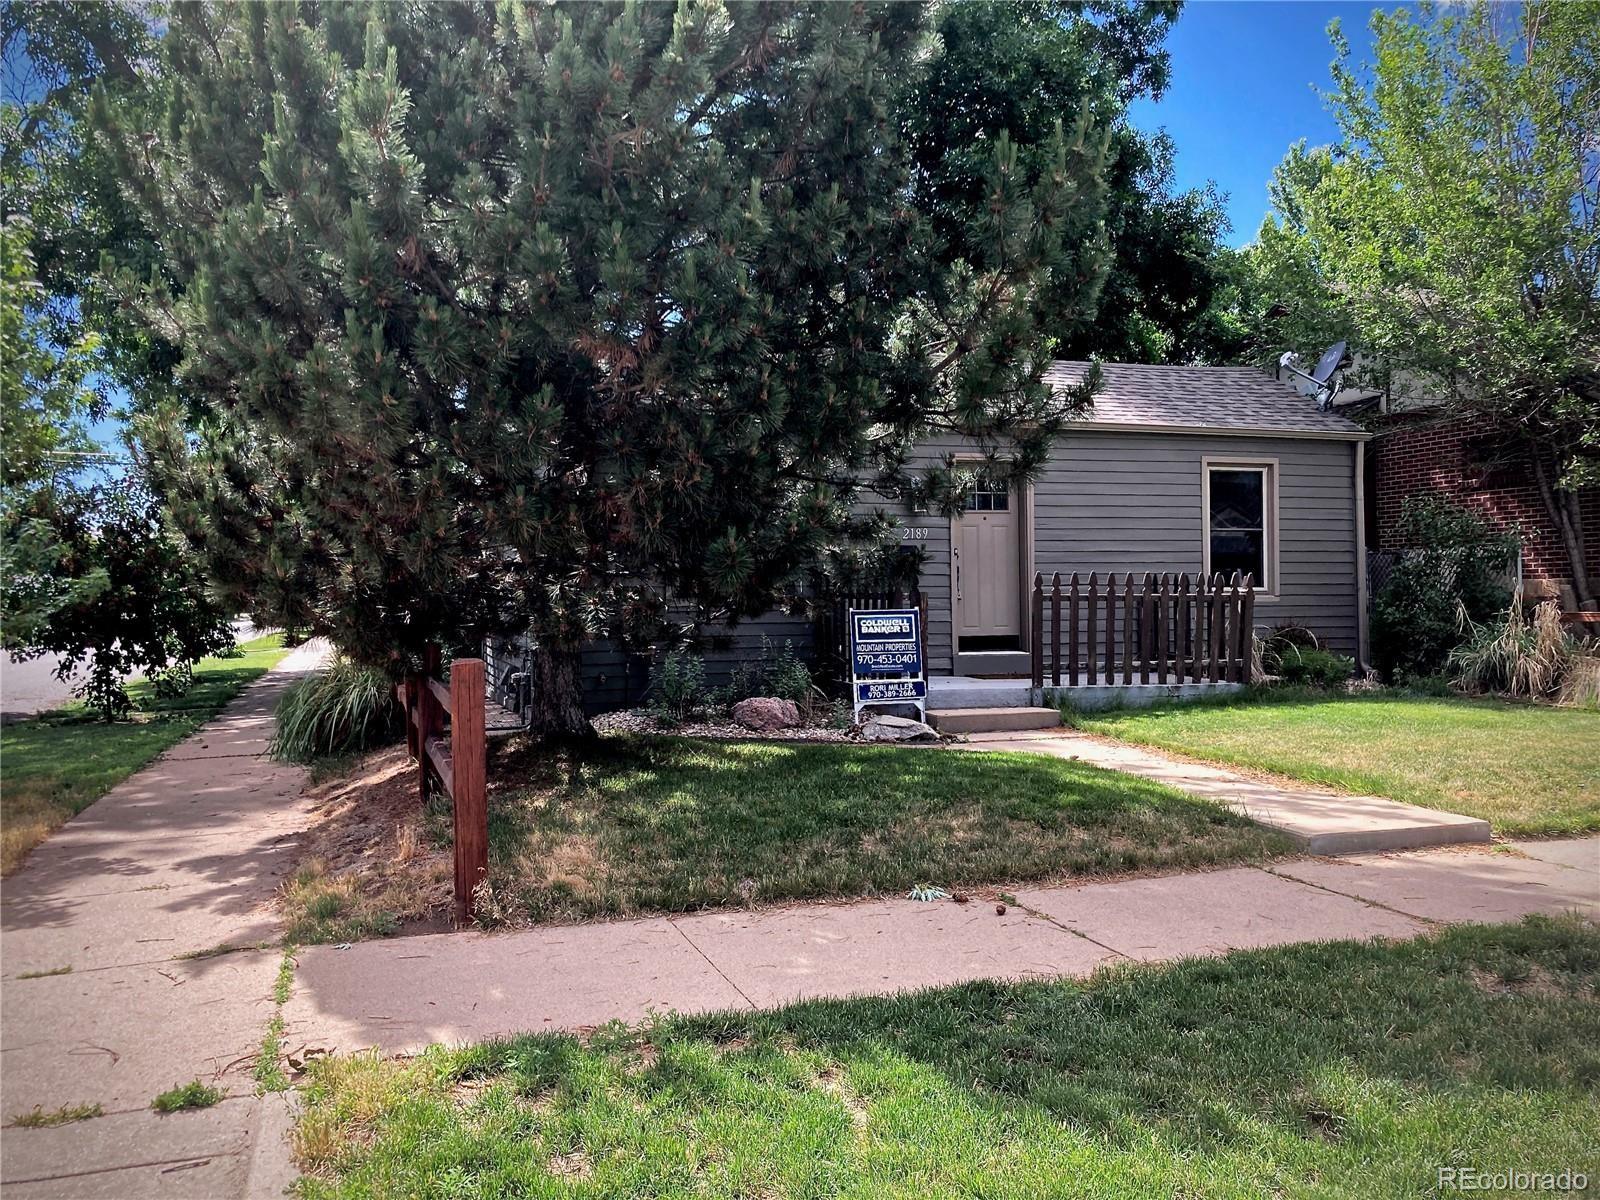 2189 S Gilpin Street, Denver, CO 80210 - #: 8989261